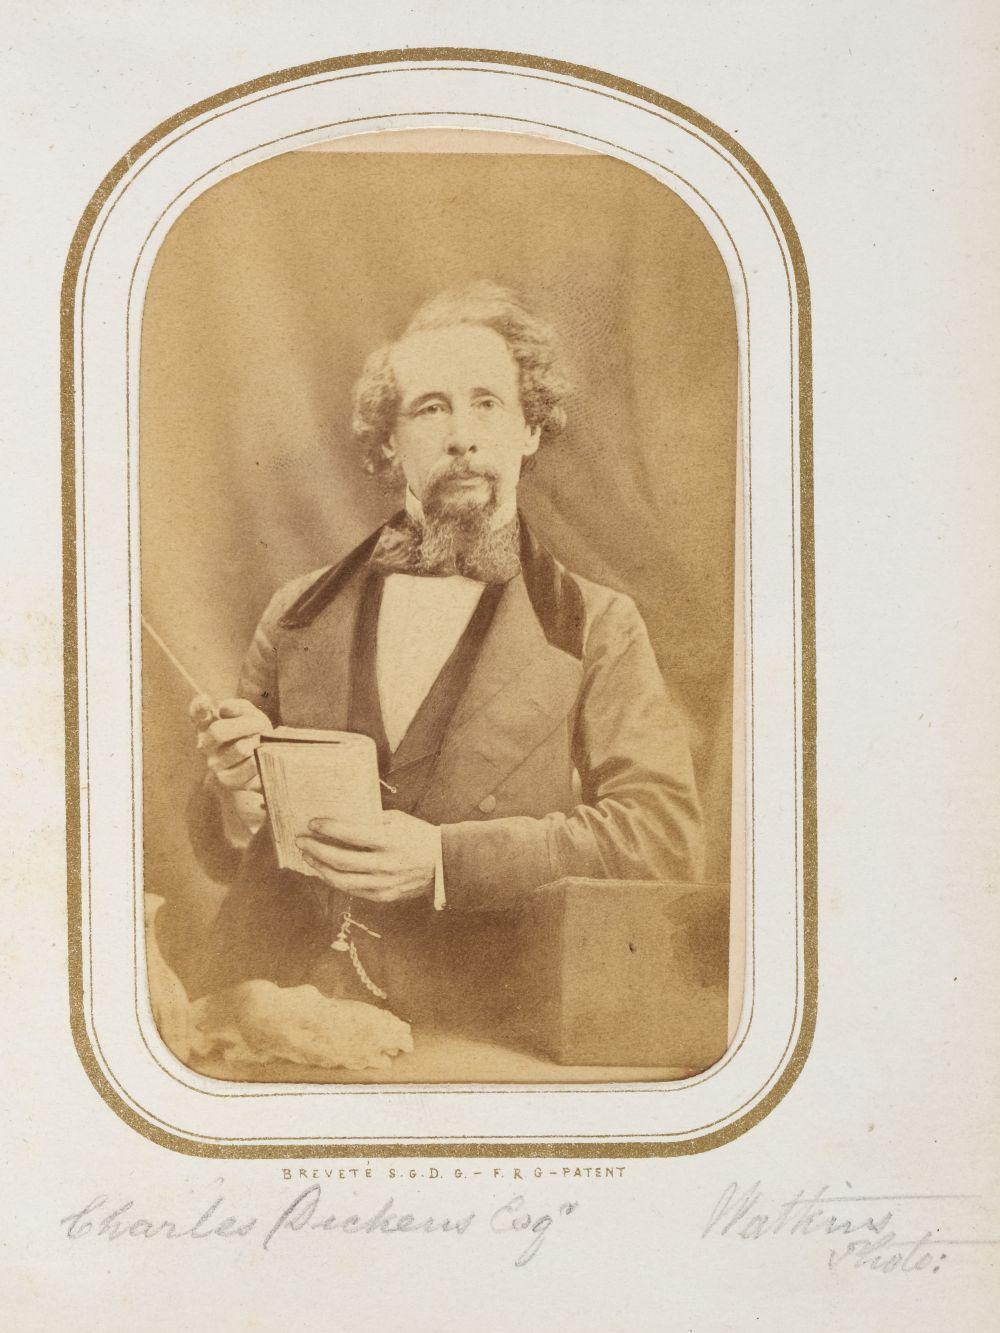 * Cartes de visite. A cartes-de-visite album, c. 1860s/1880s - Image 8 of 18